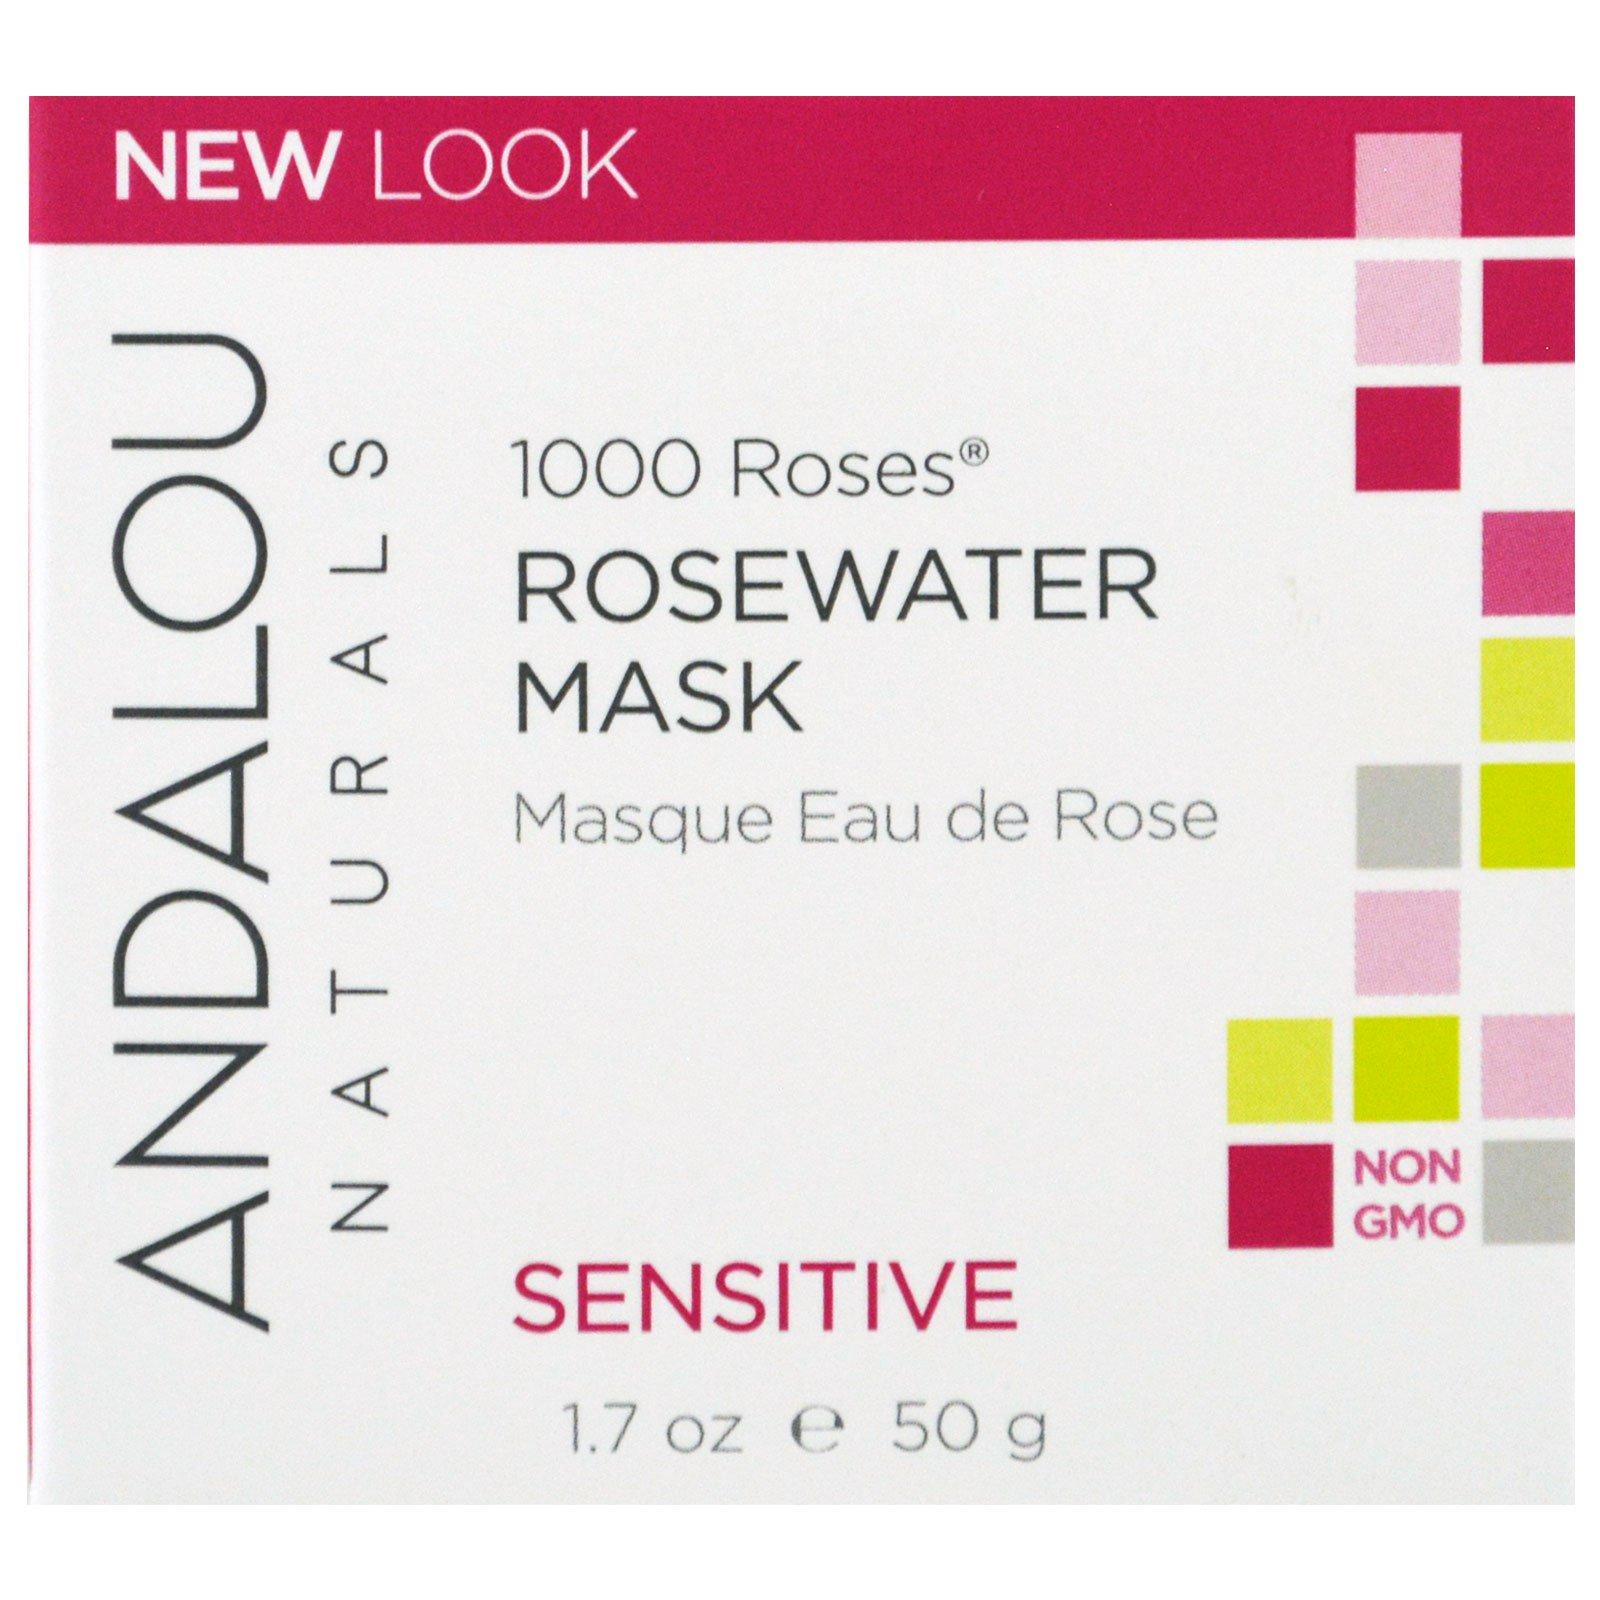 Brightening Pumpkin Honey Glycolic Mask by andalou naturals #20